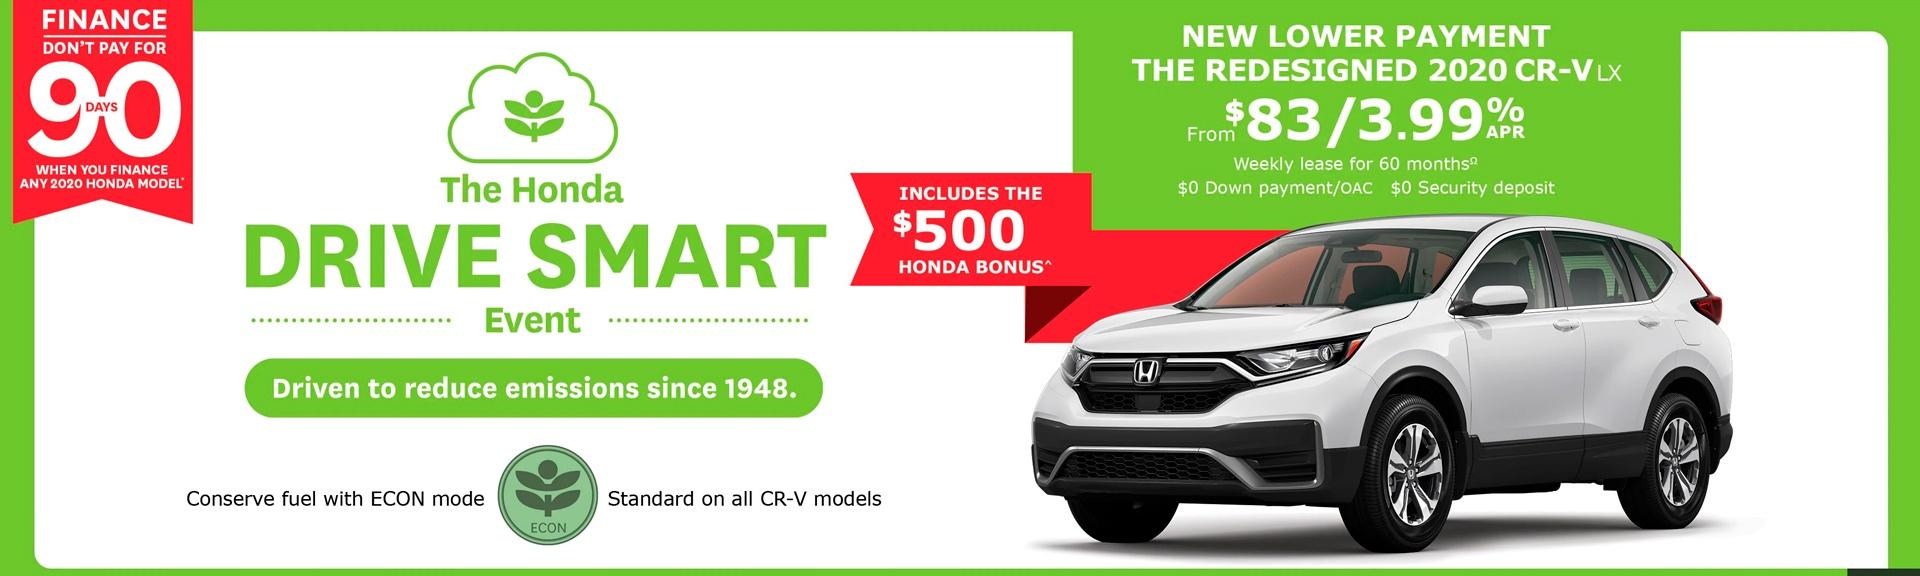 2020-Honda-CR-V-LX